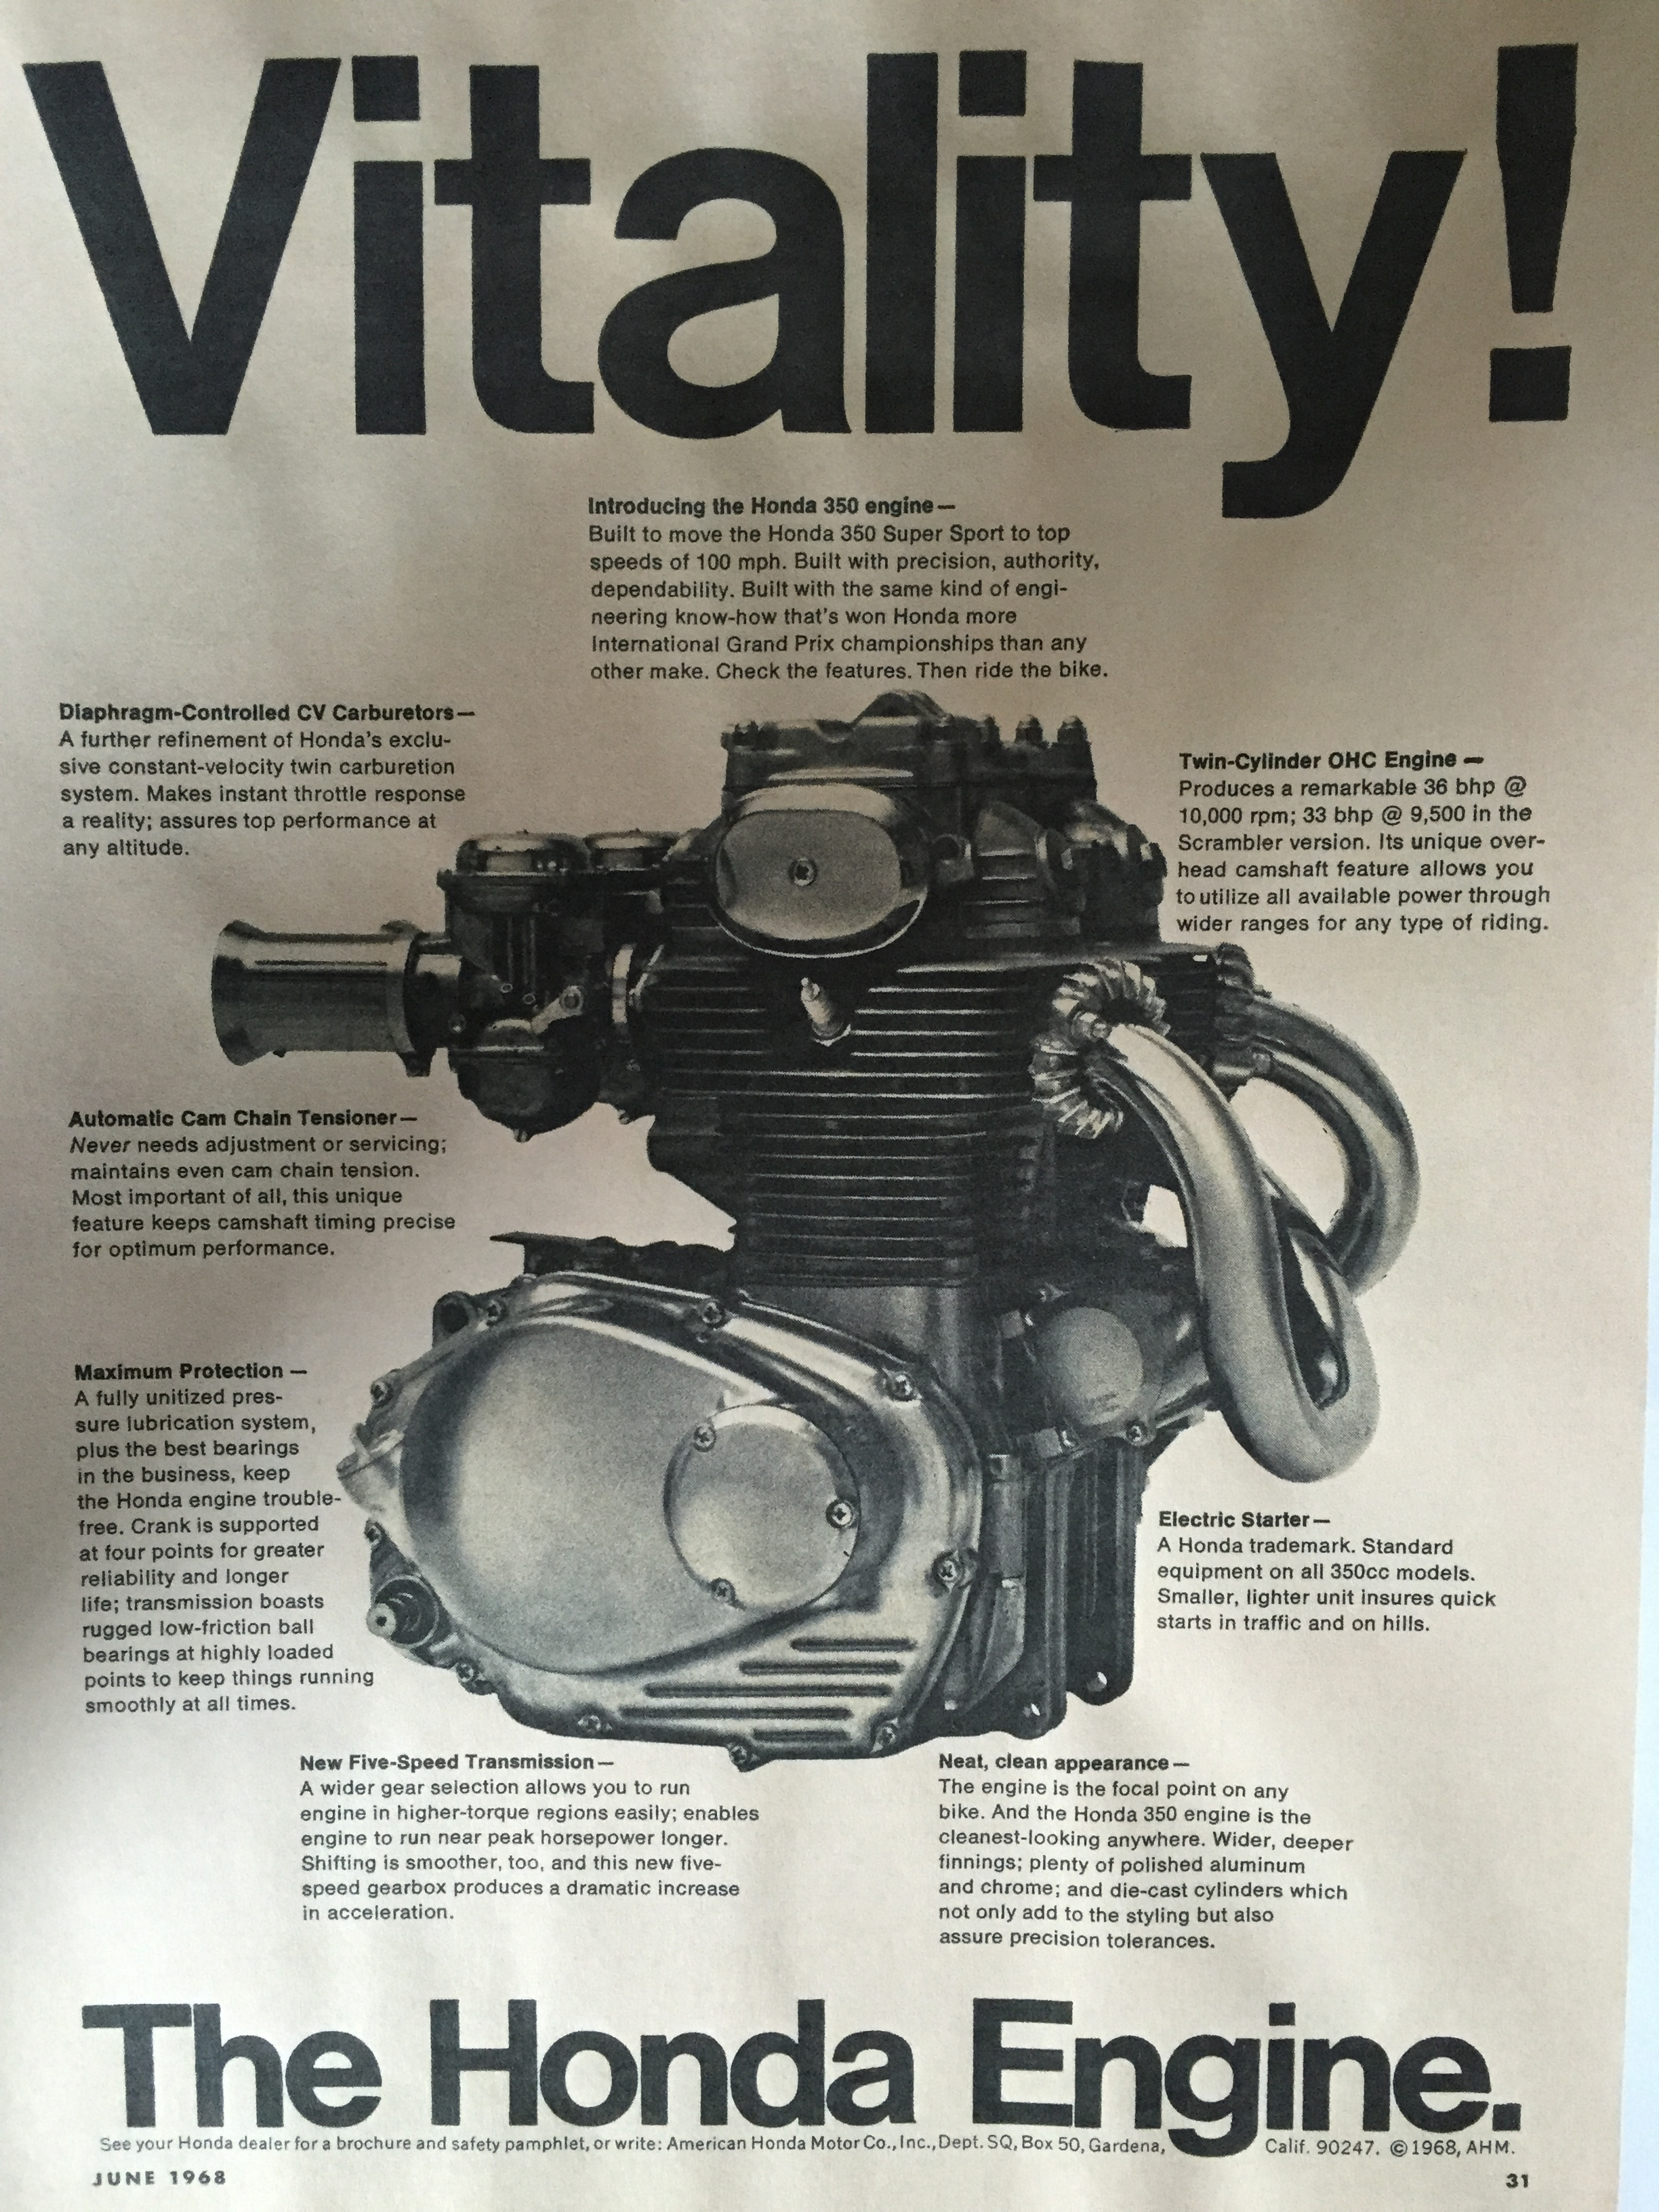 1960s Honda Magazine Ads